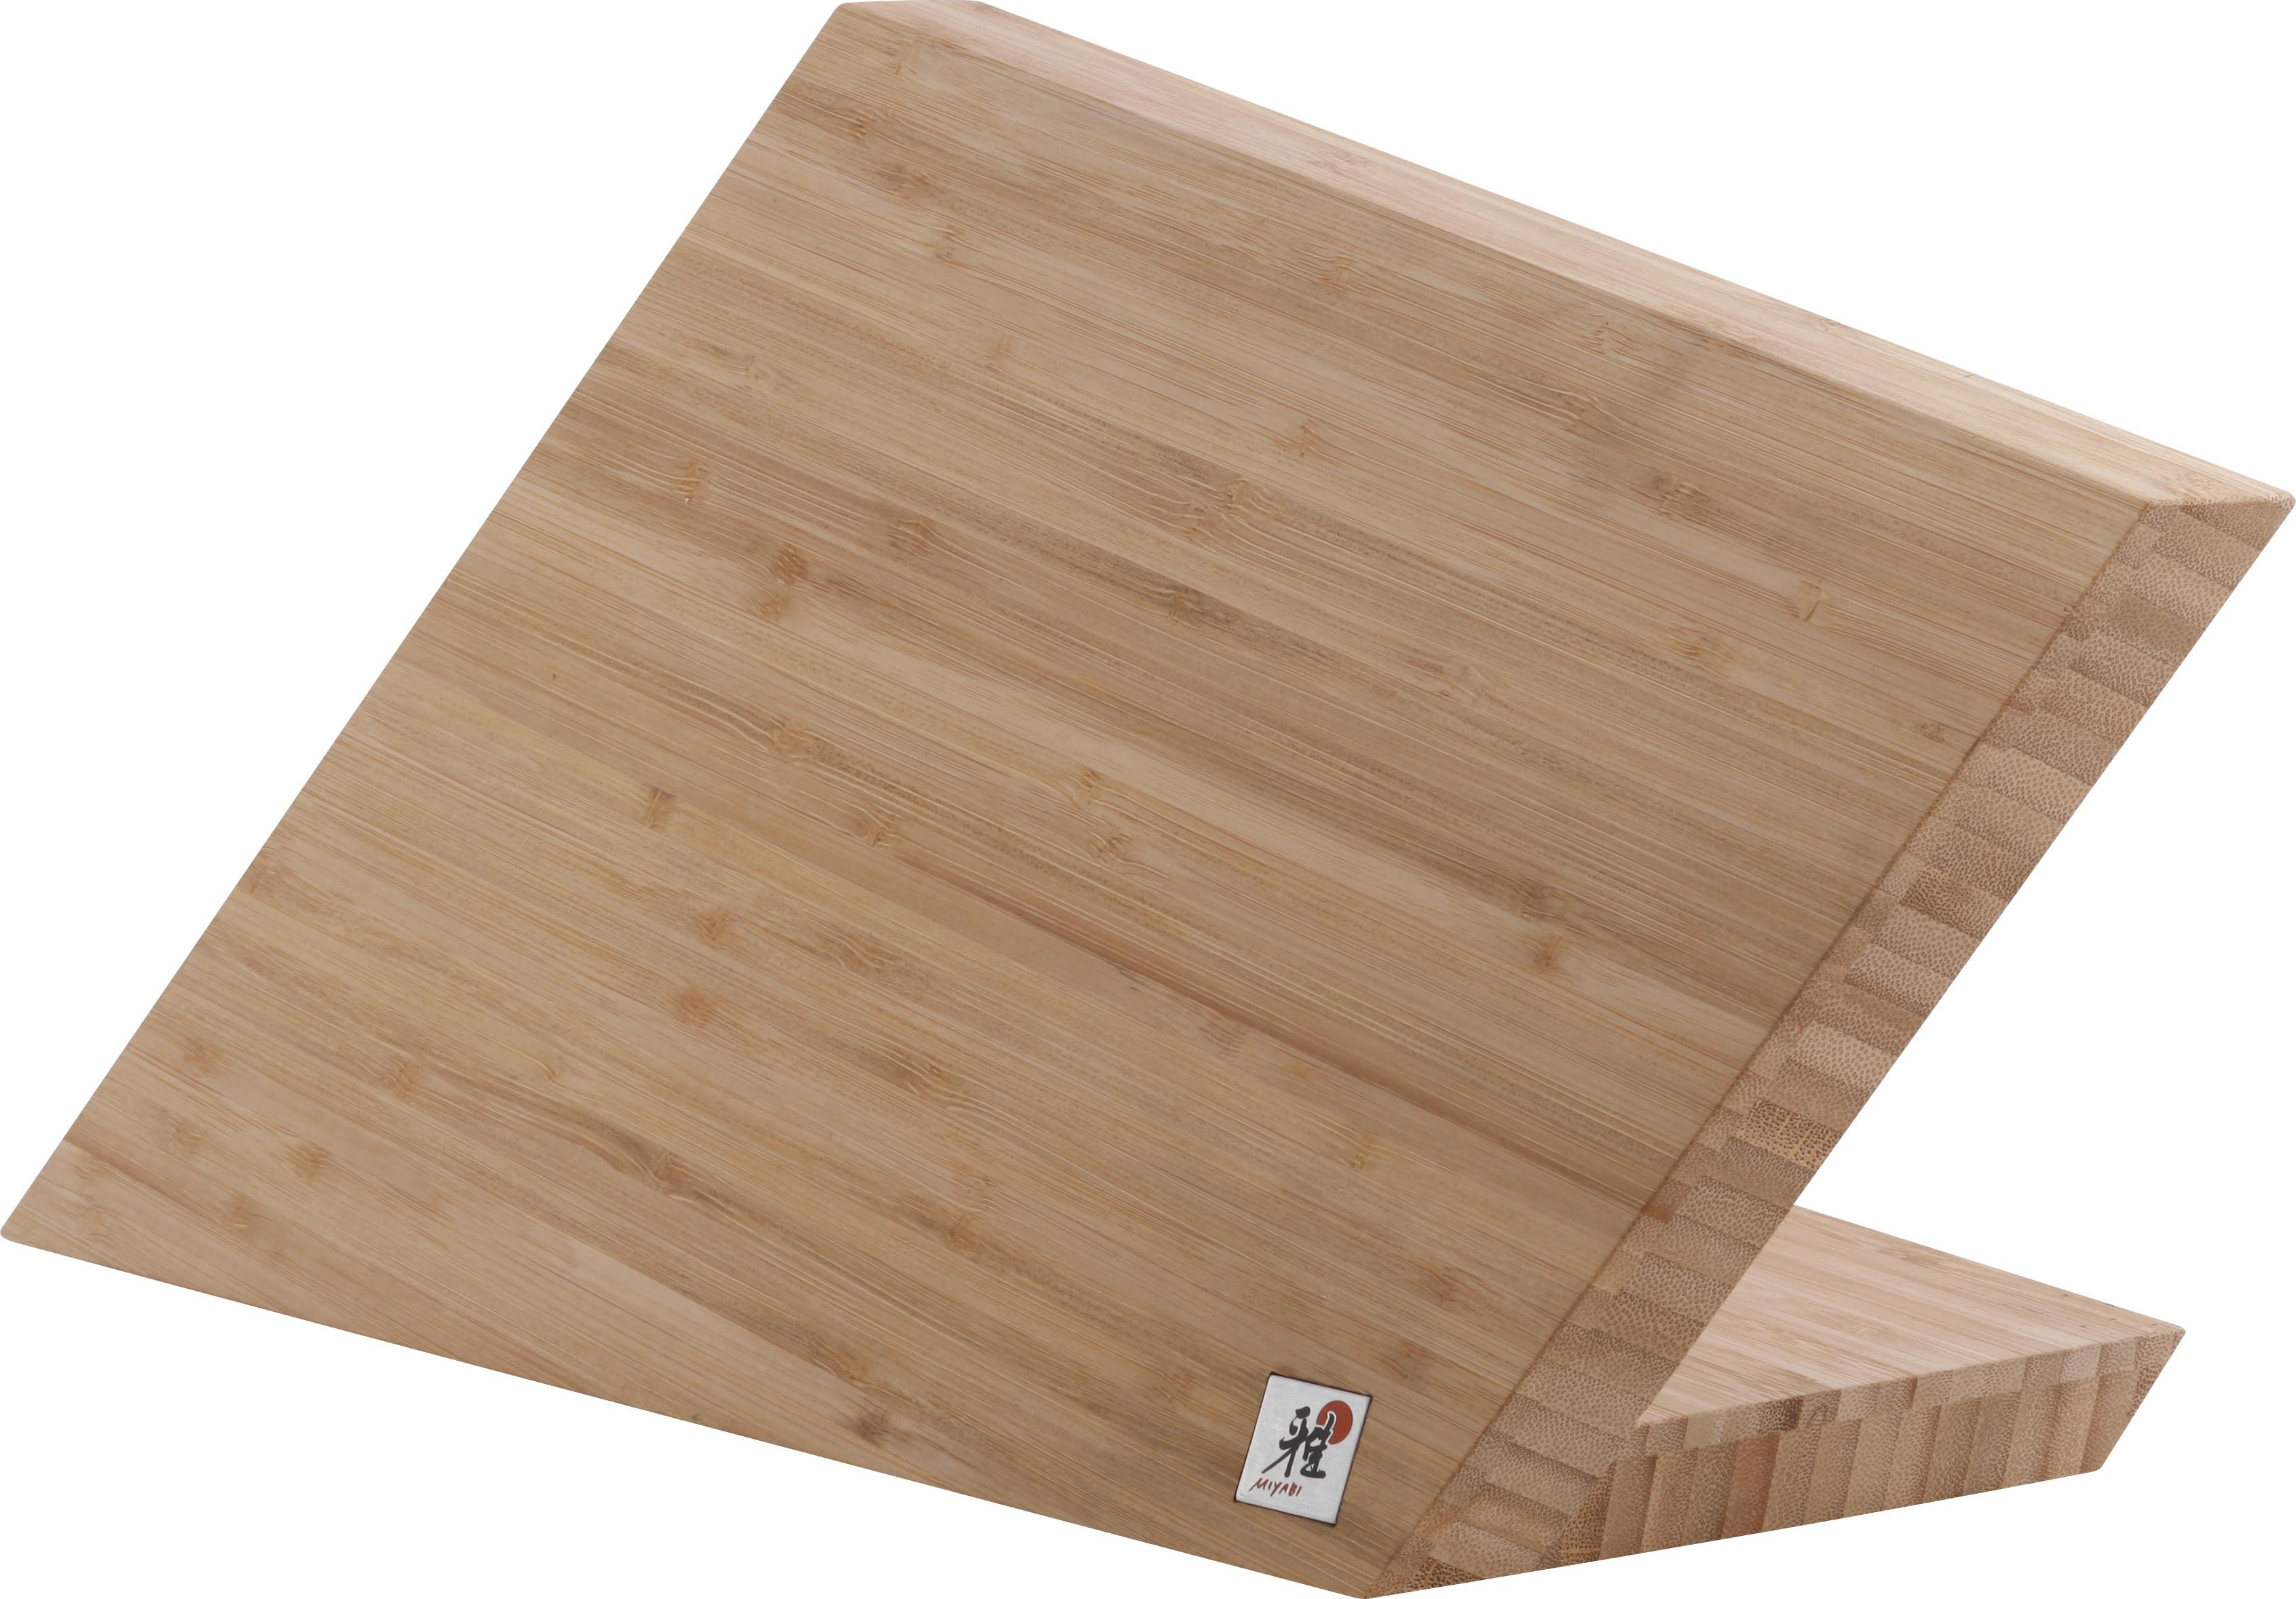 online shop miyabi magnet messerblock bambus kaufen. Black Bedroom Furniture Sets. Home Design Ideas